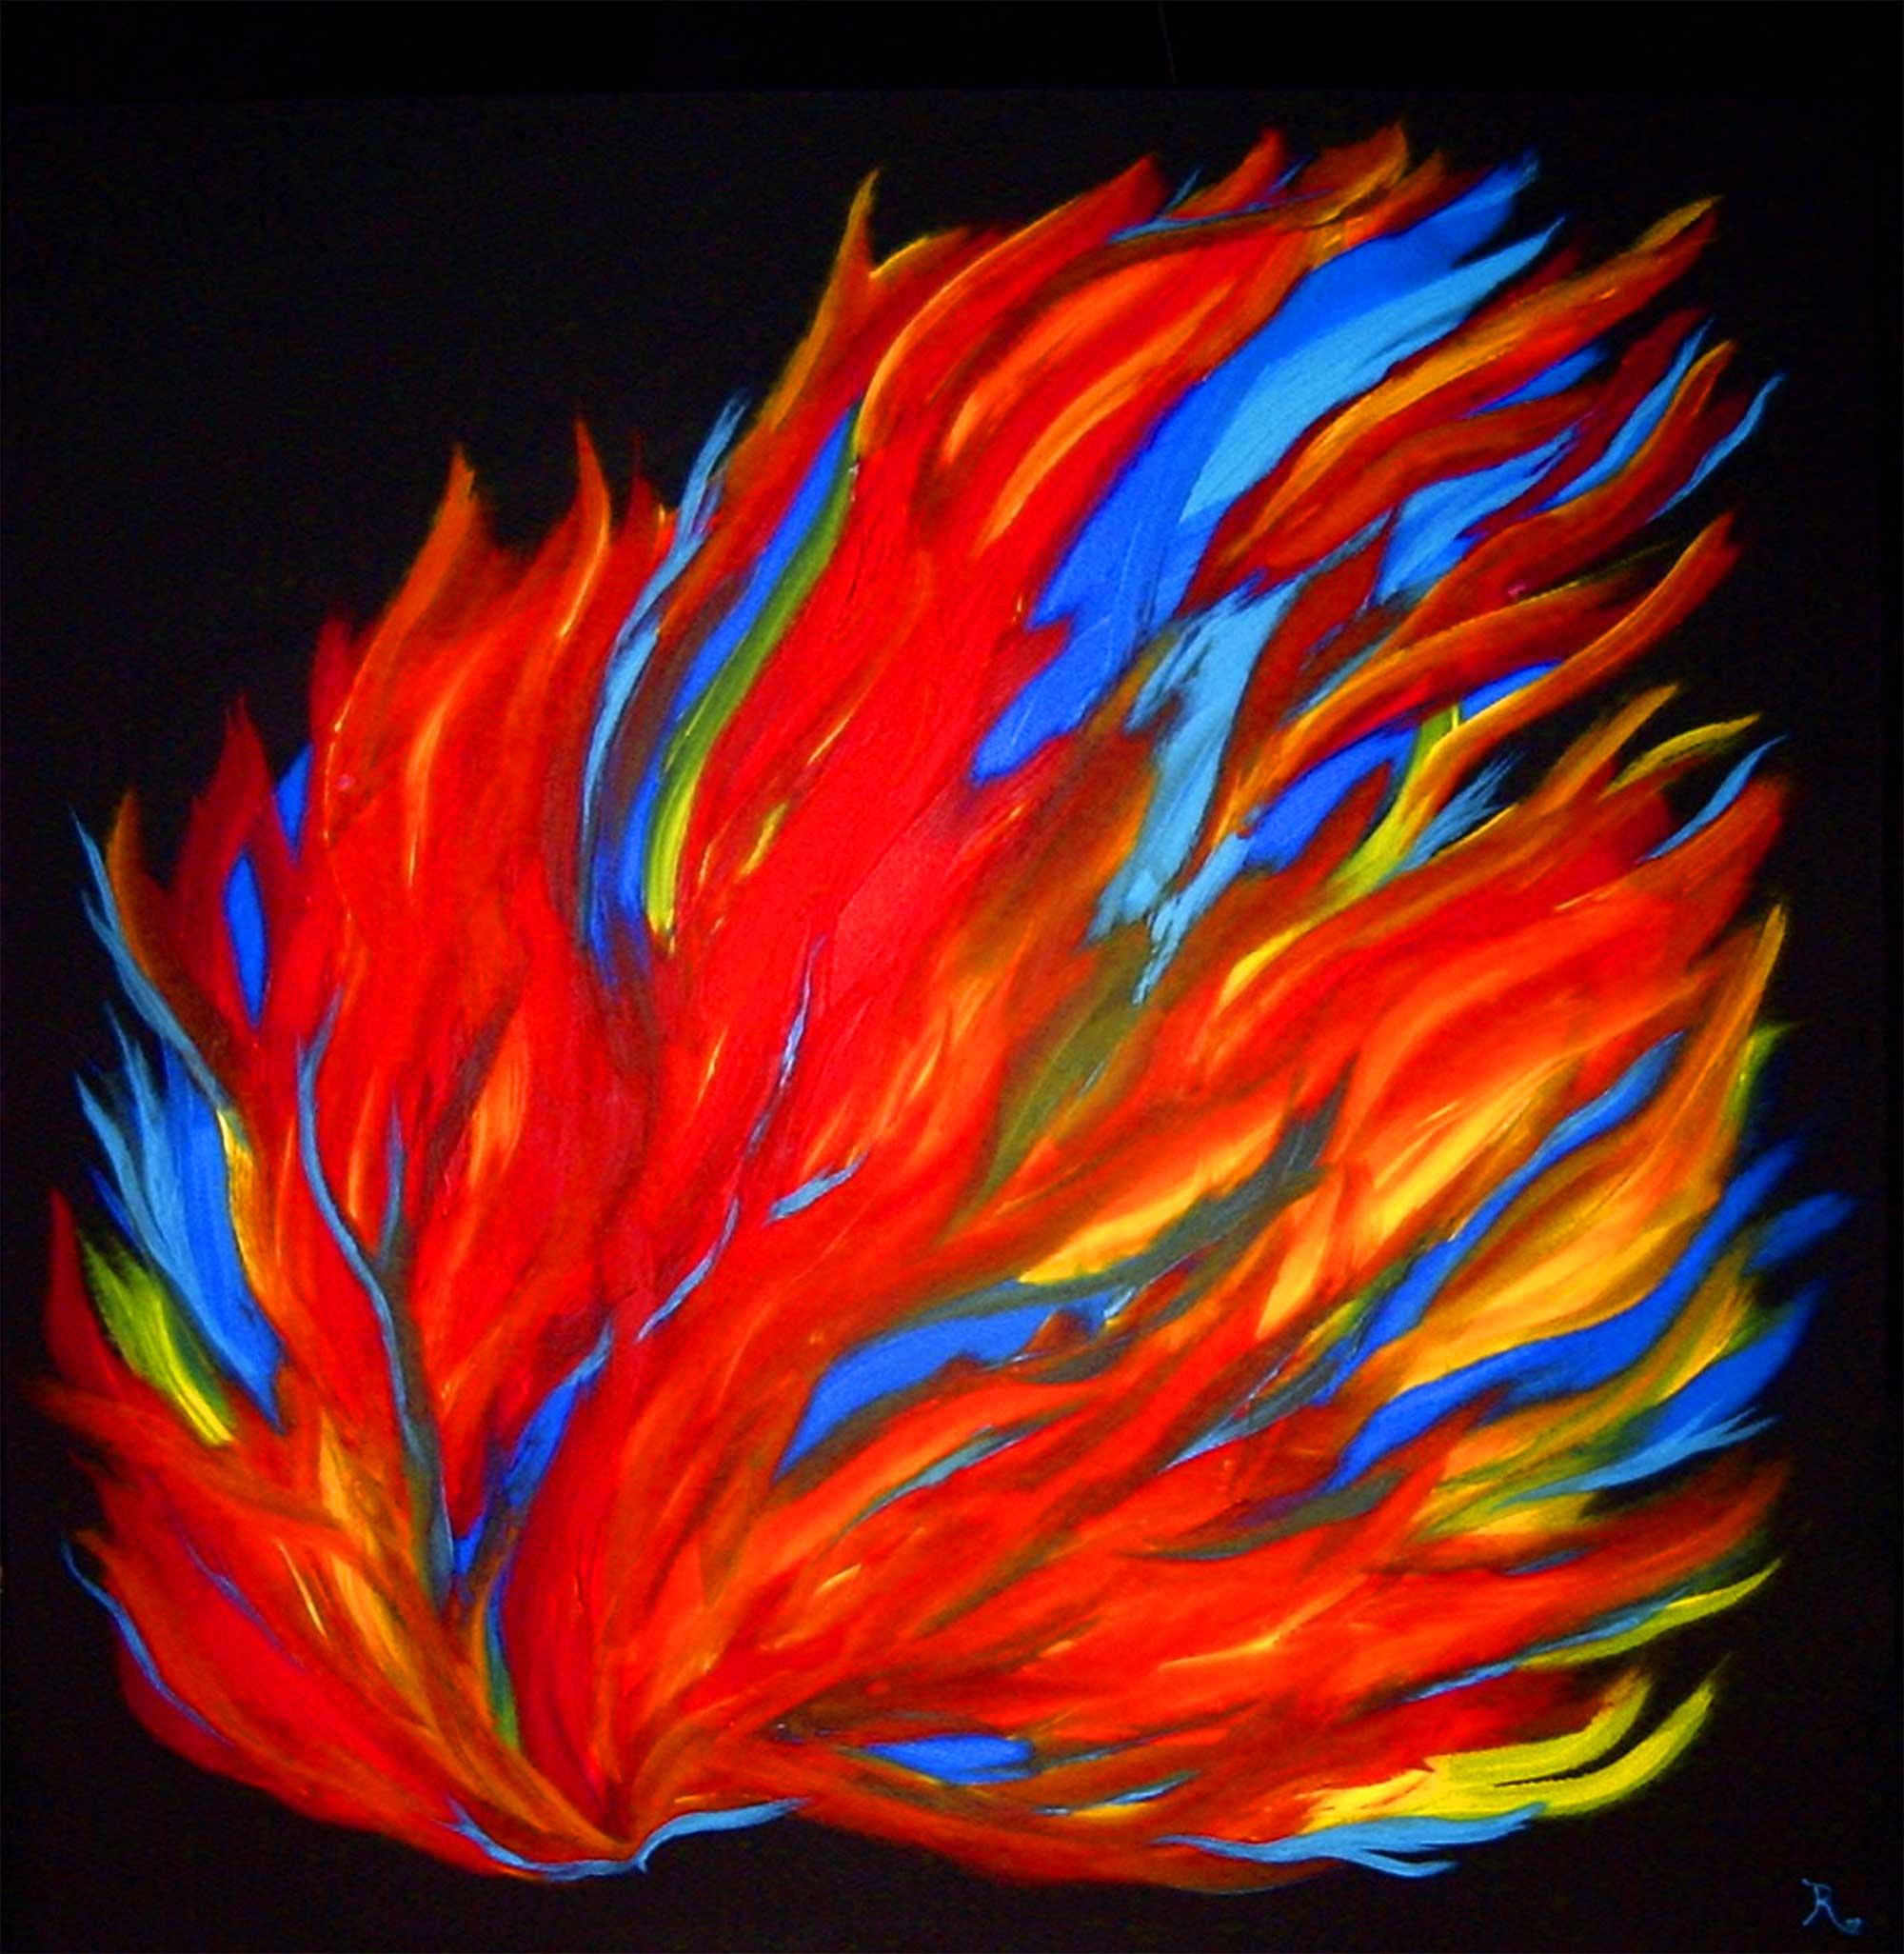 FireStorm-Emotions-CA.jpg